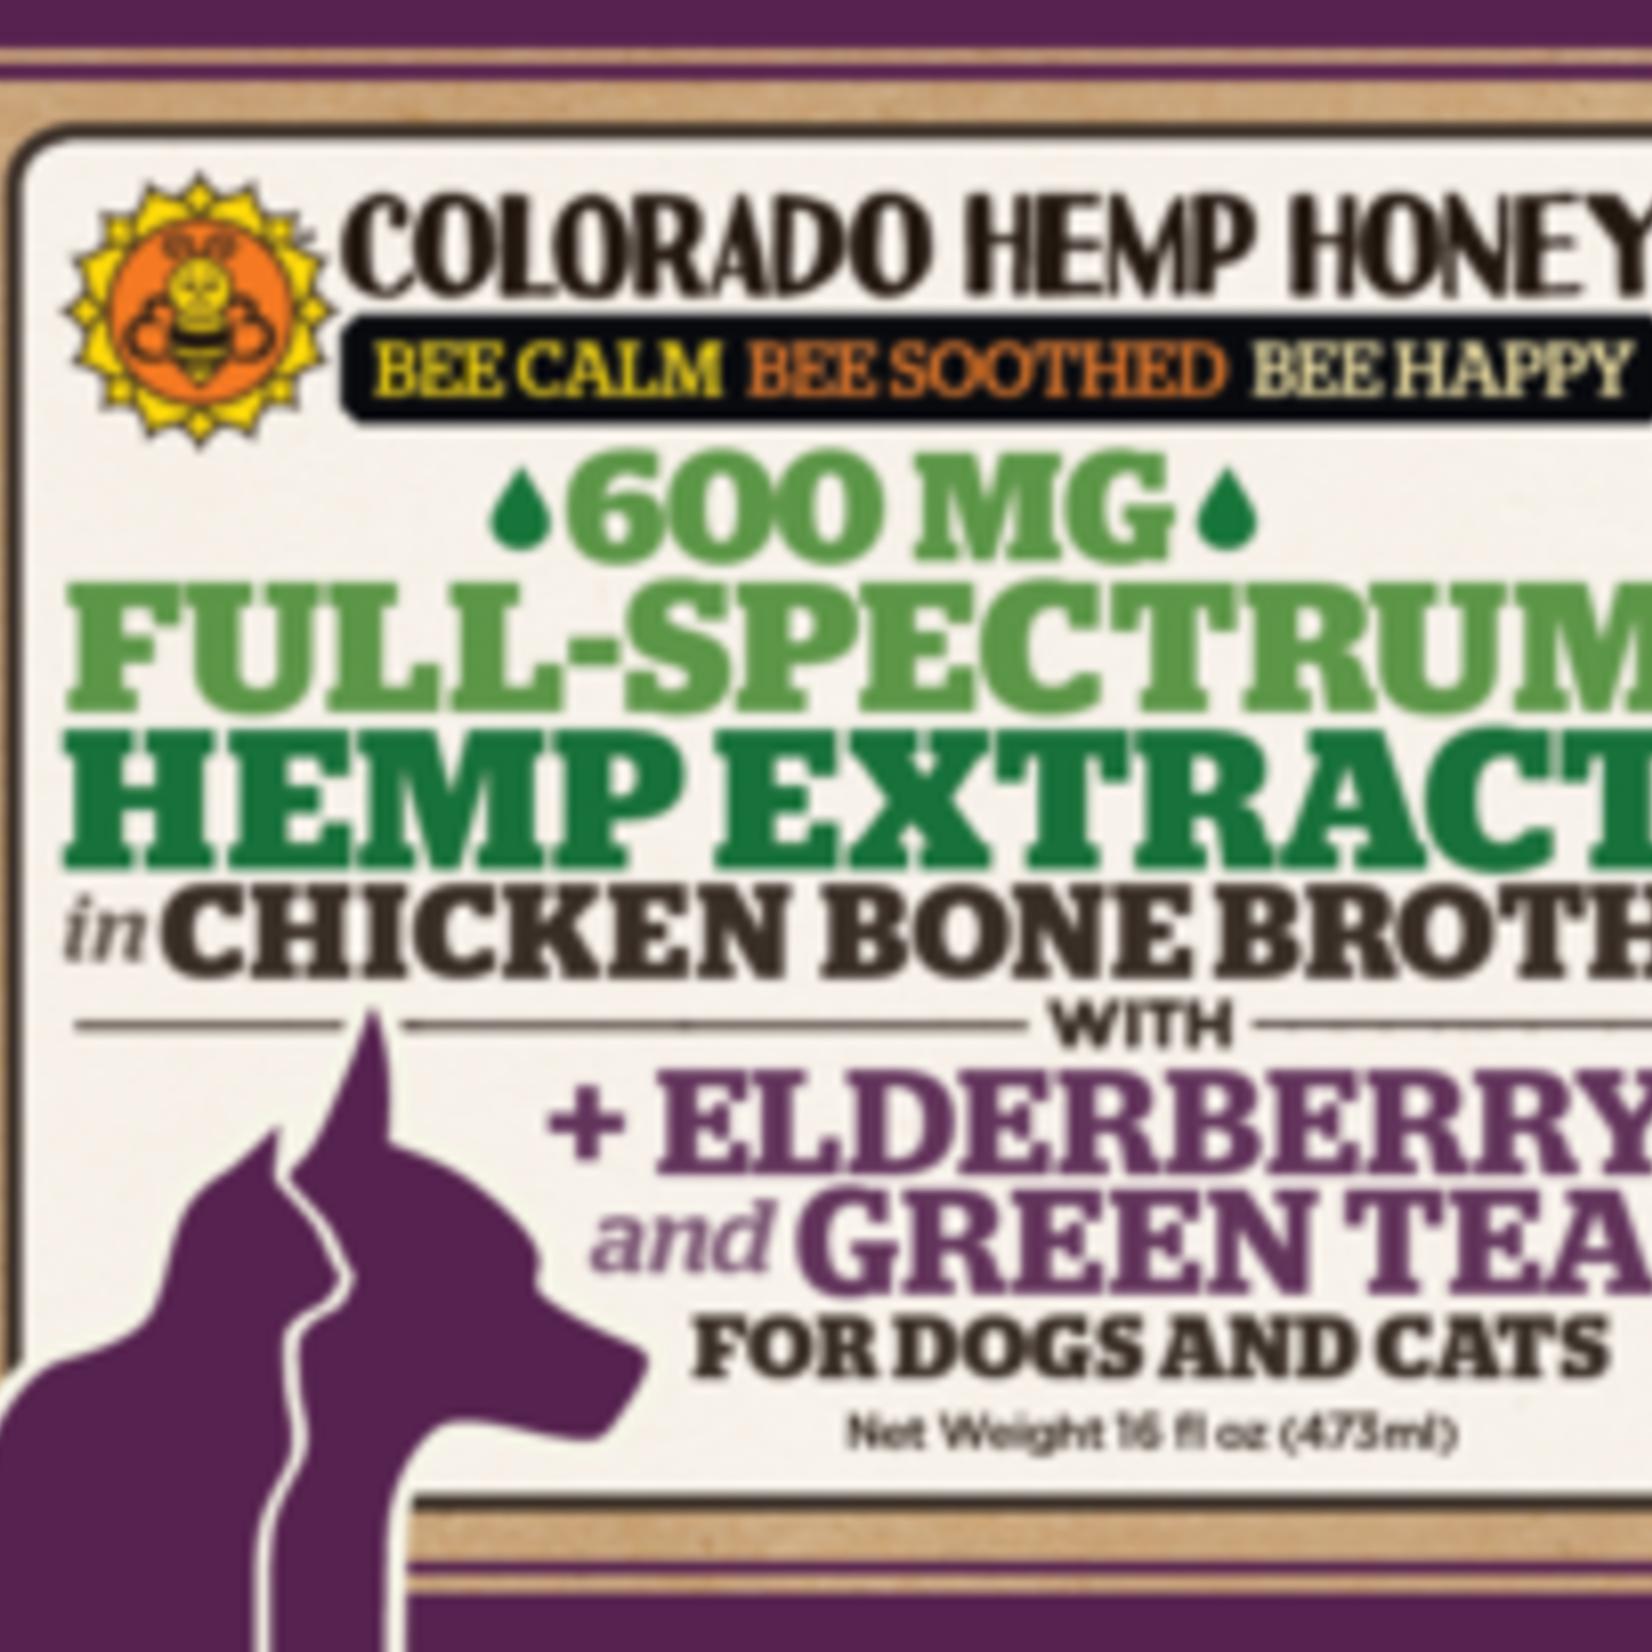 Colorado Hemp Honey Colorado Hemp Full Spectrum 600 MG Chicken Bone Broth